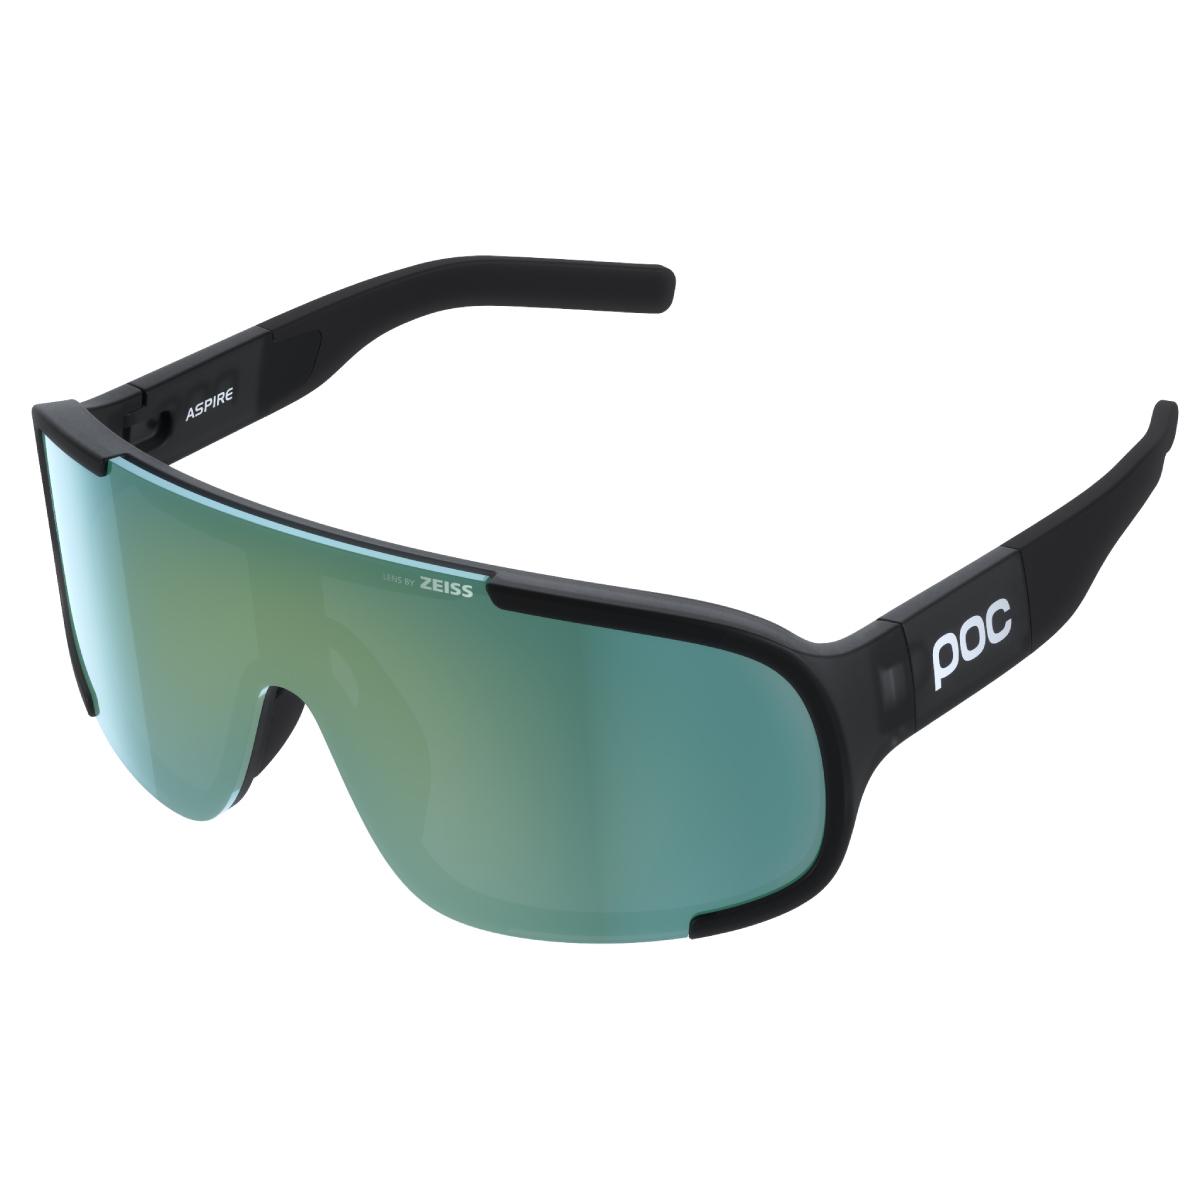 lunettes-poc-aspire-noir-translucide